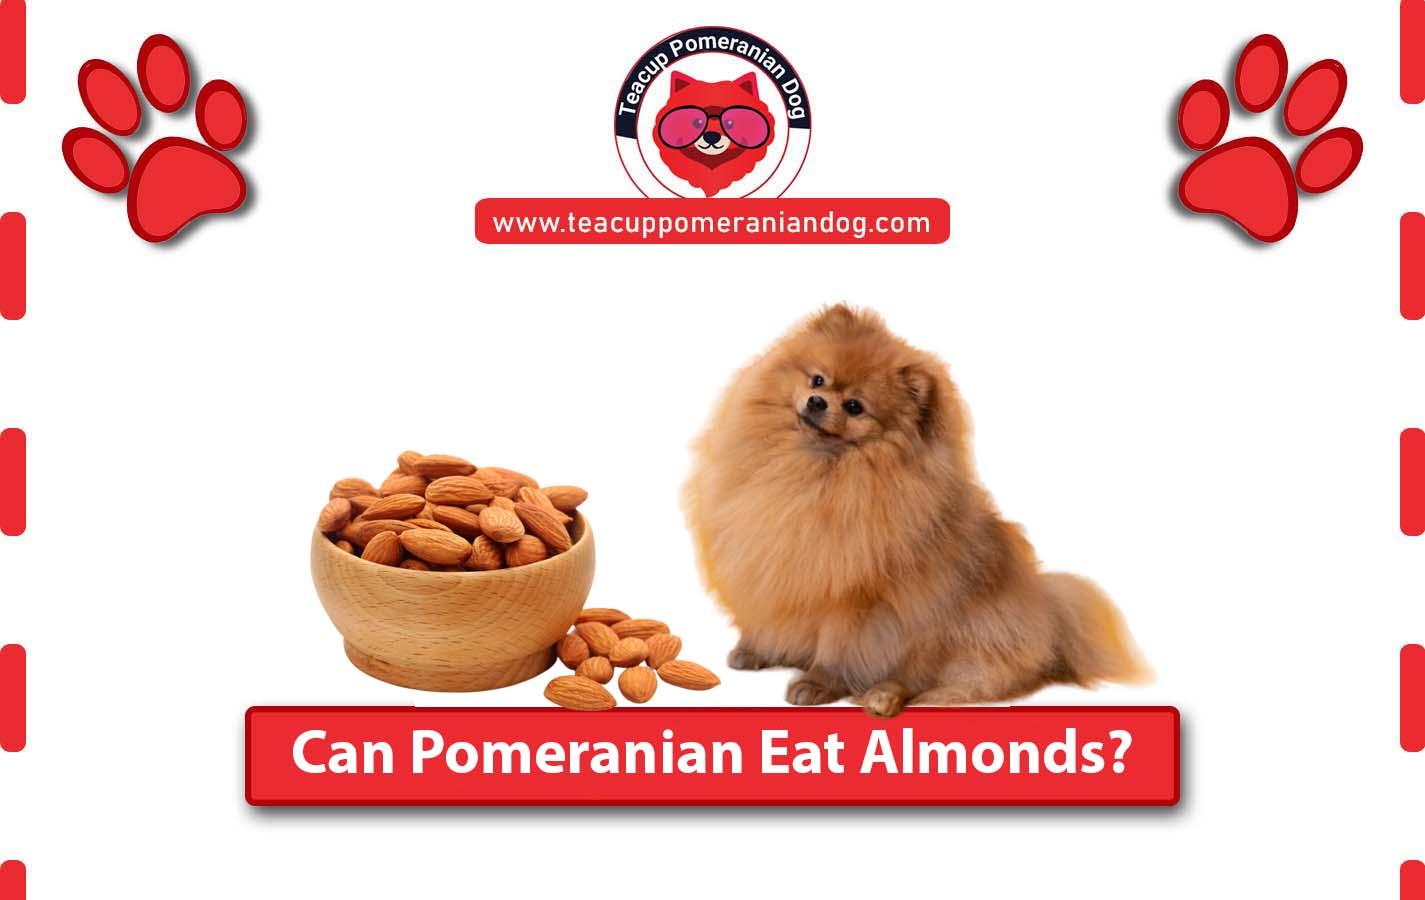 Can Pomeranian Eat Almonds